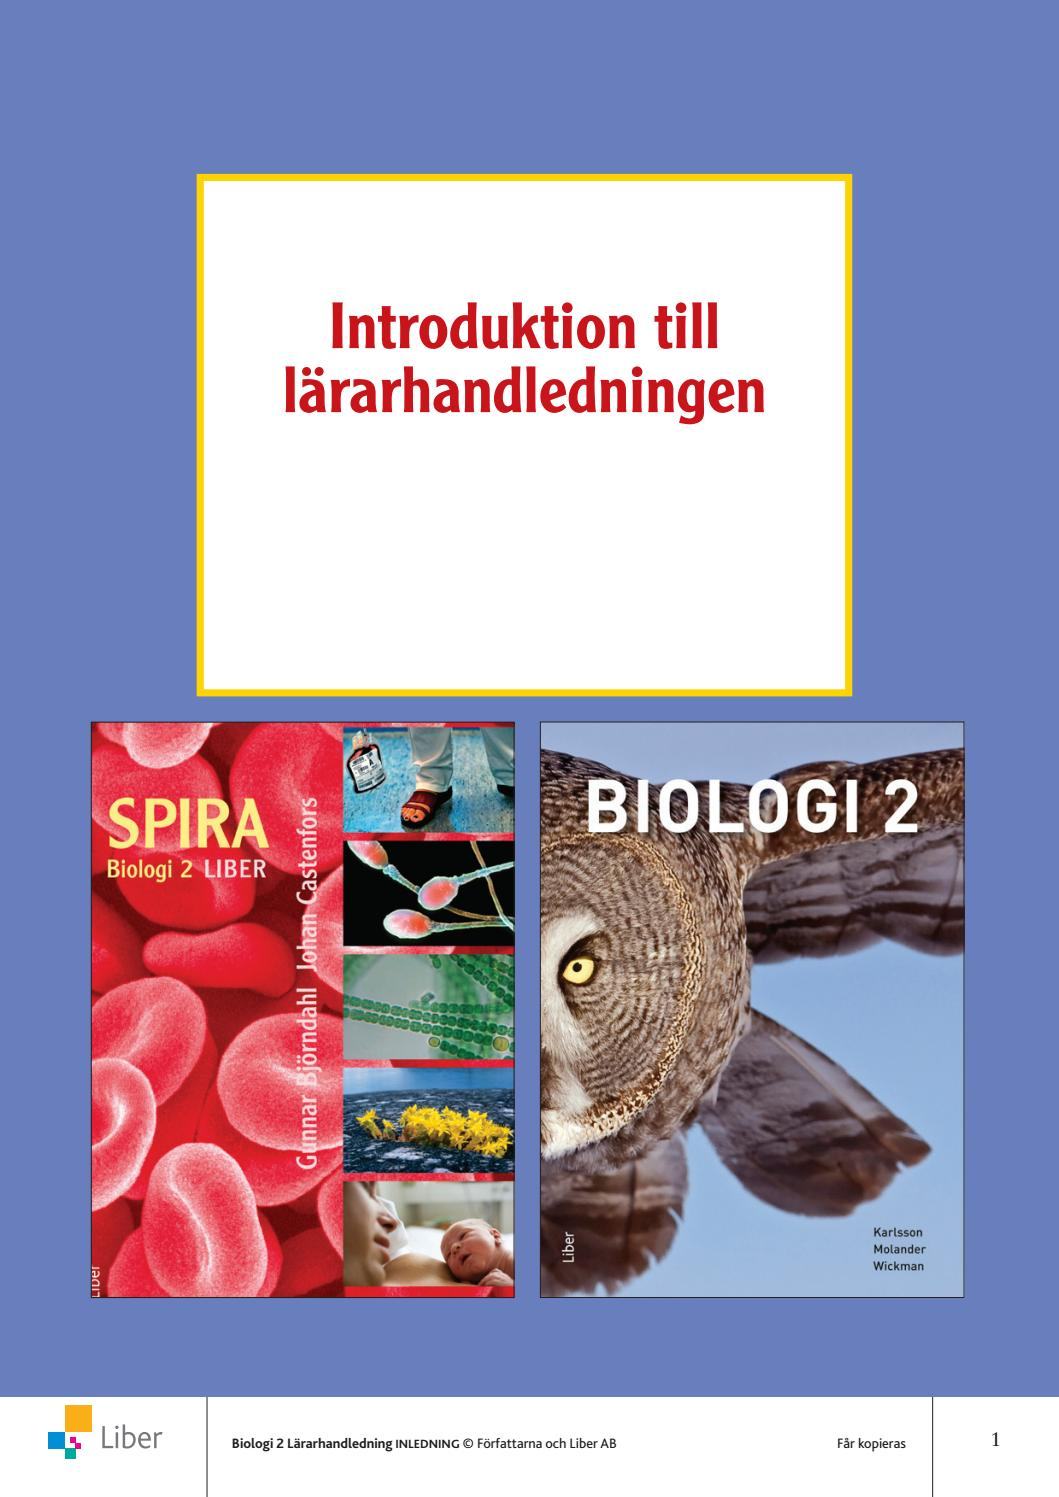 spira biologi 2